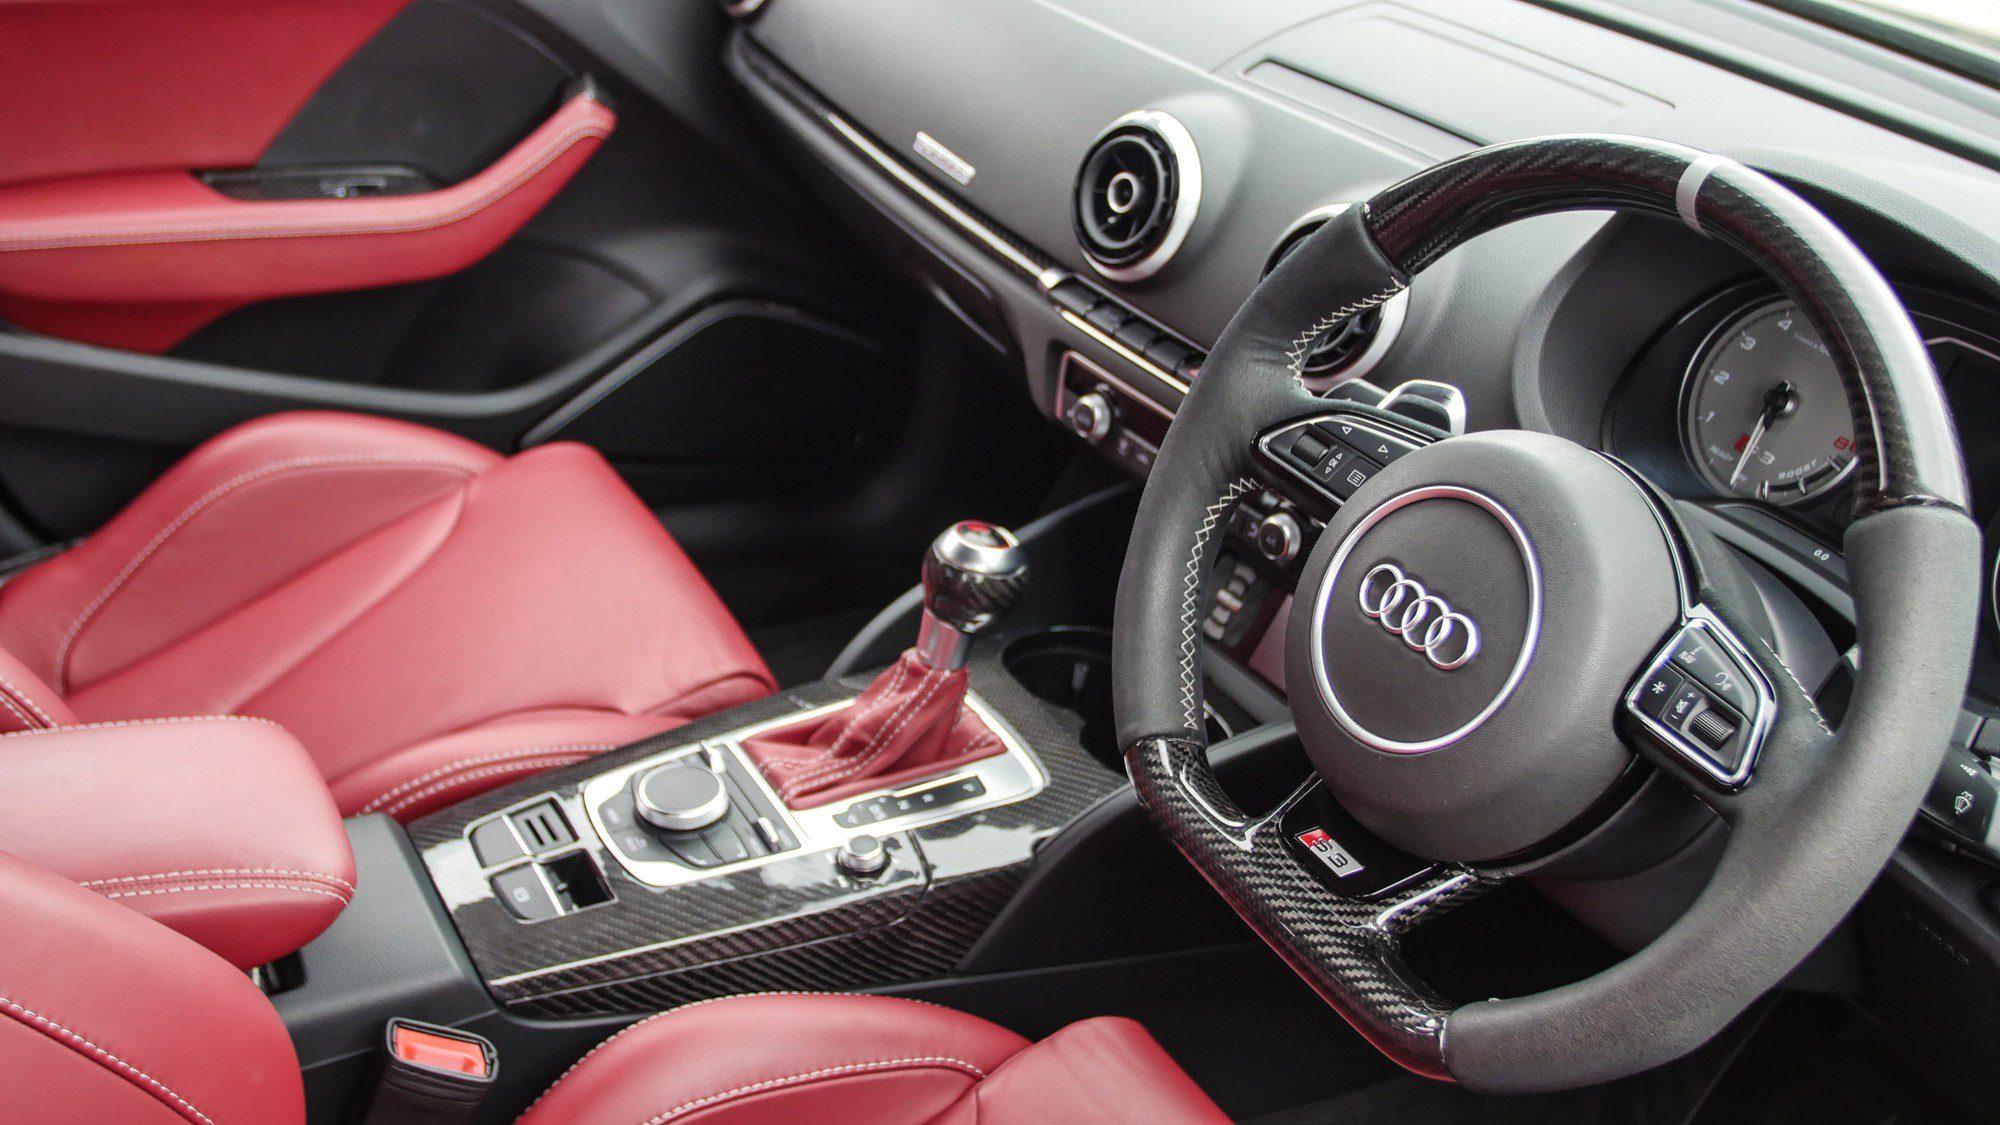 Innenraum der Audi S3 Limousine